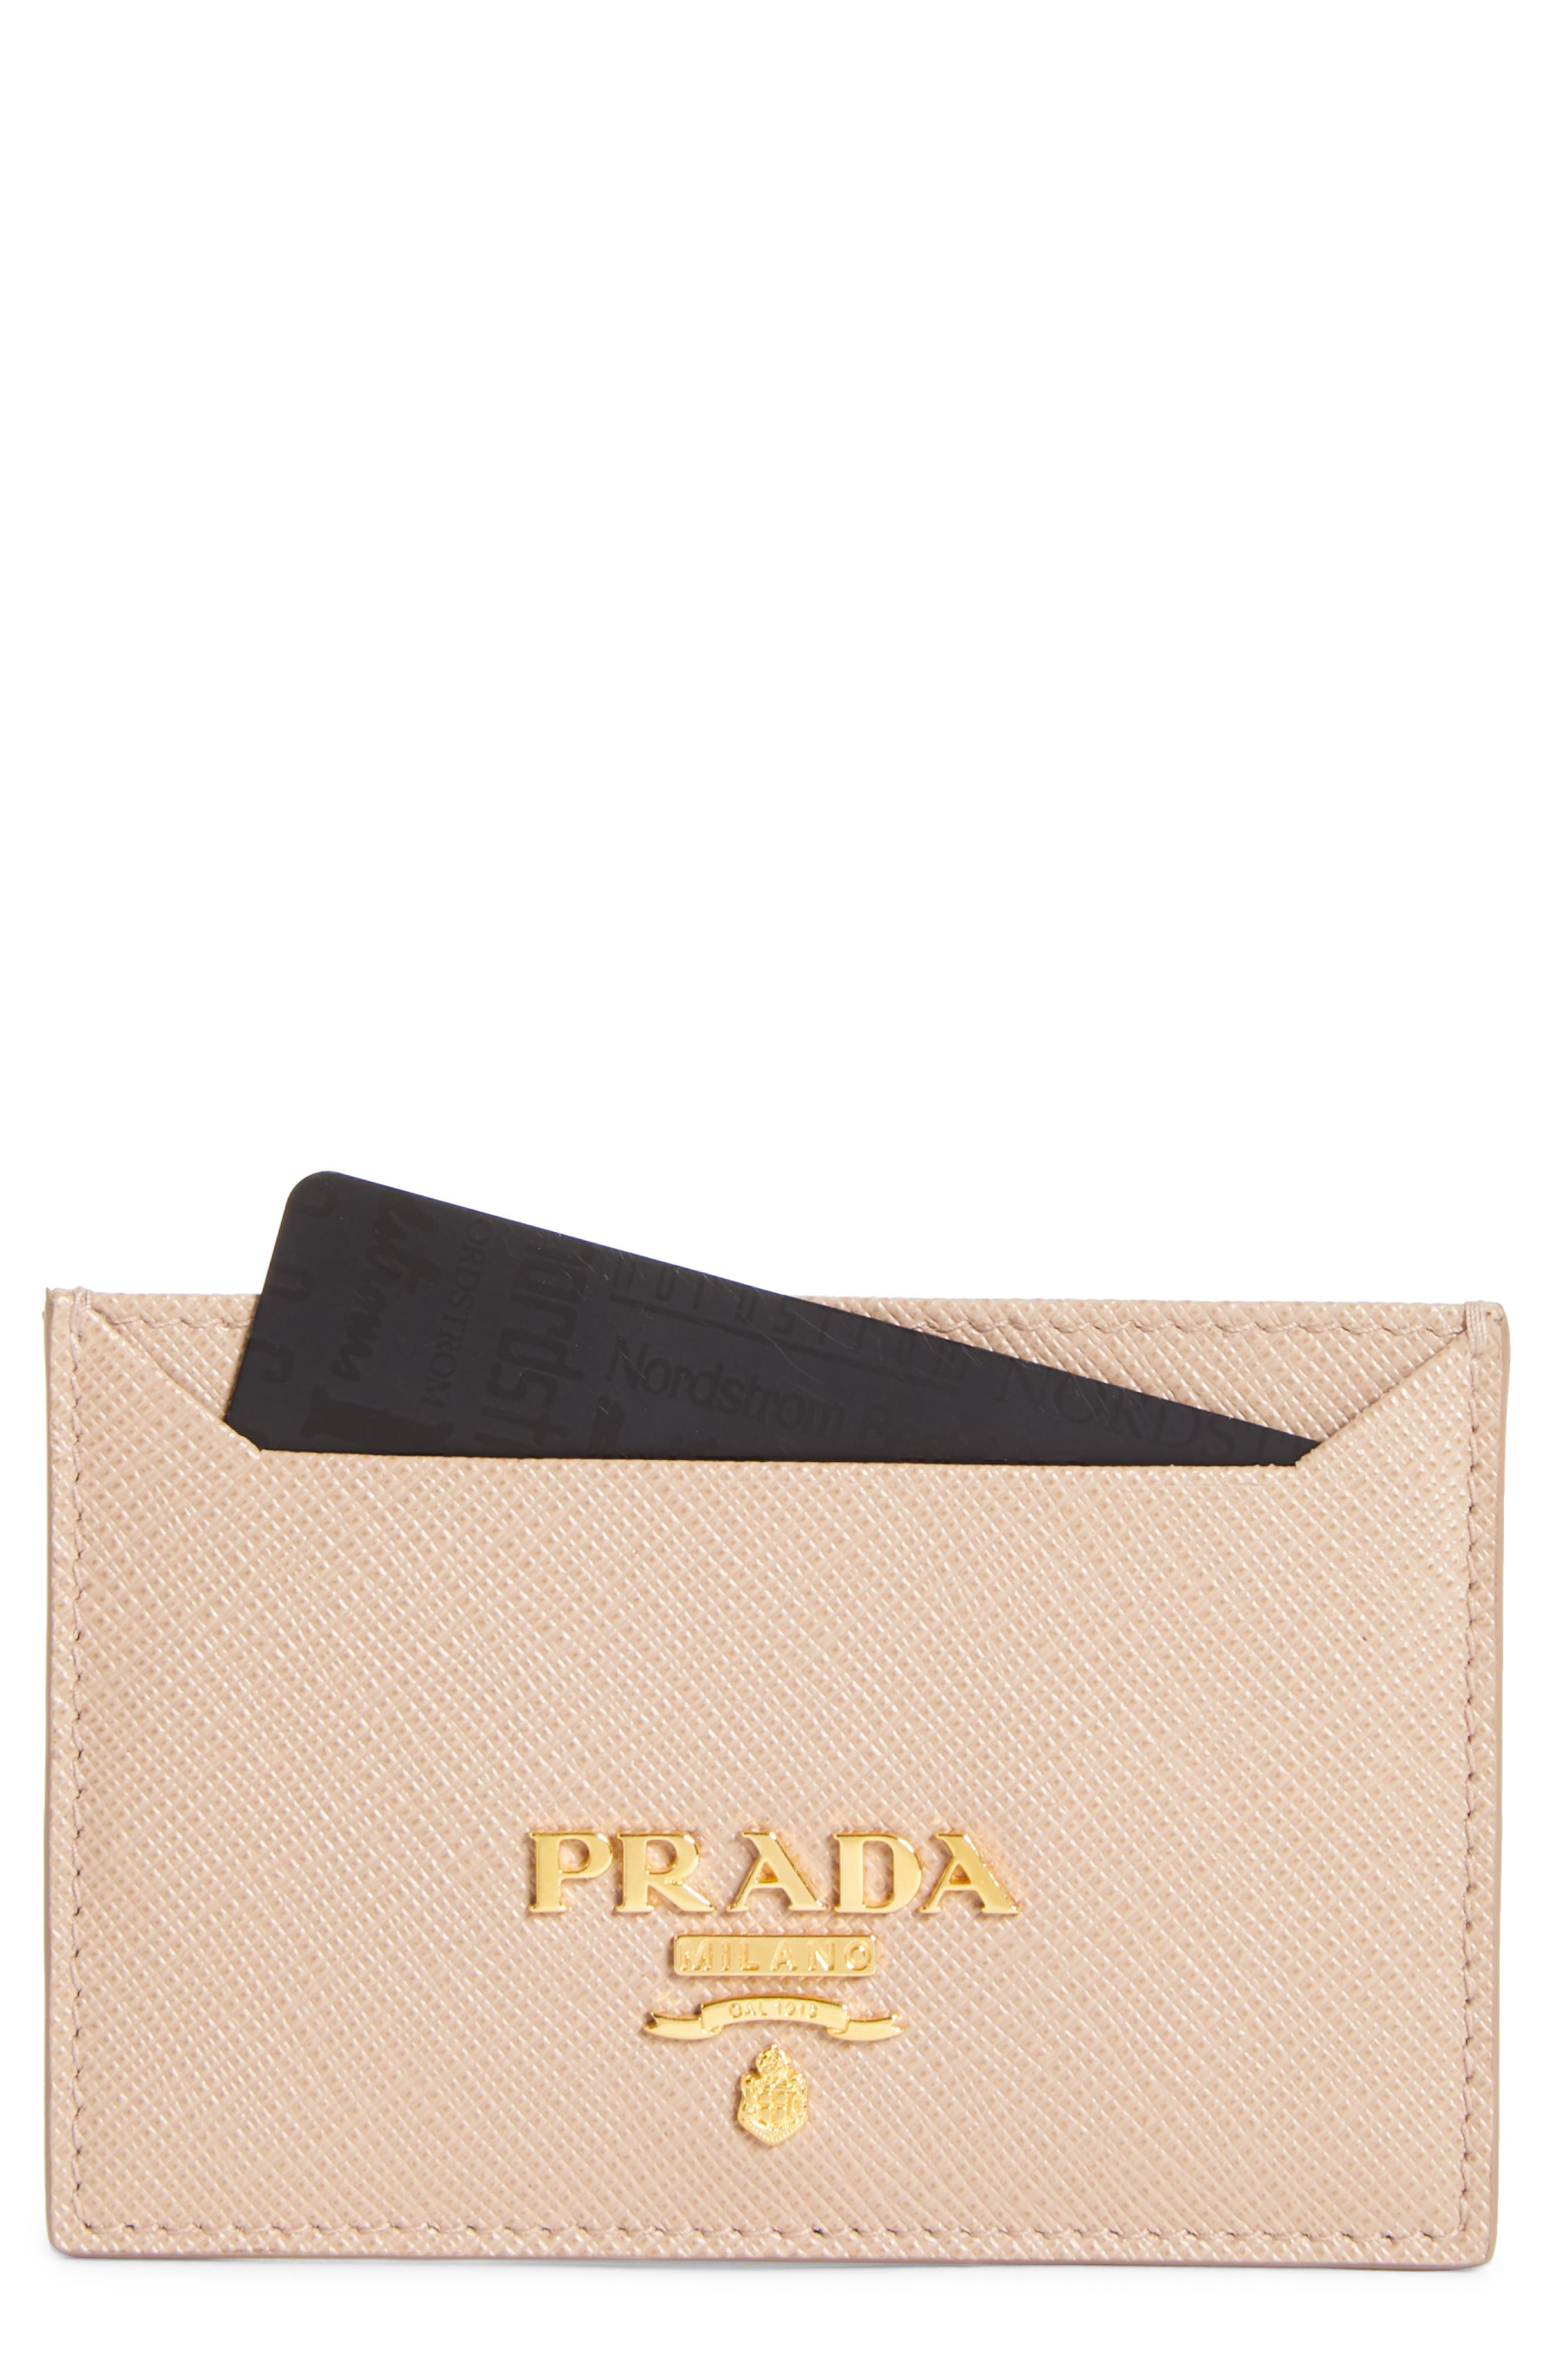 Saffiano Metal Oro Calfskin Leather Card Case,                             Main thumbnail 1, color,                             Cipria